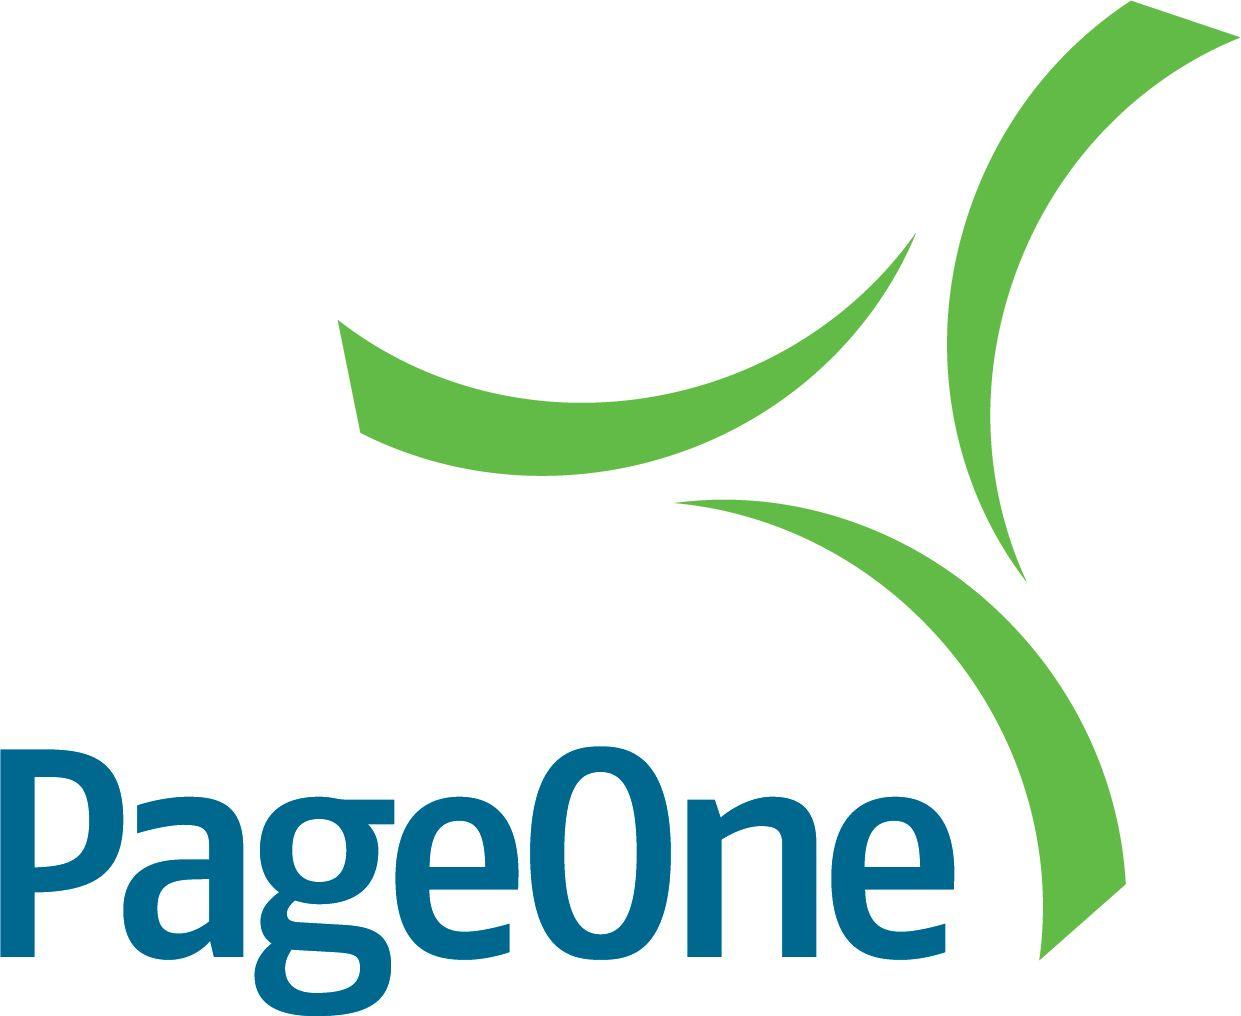 PageOne Communications Ltd